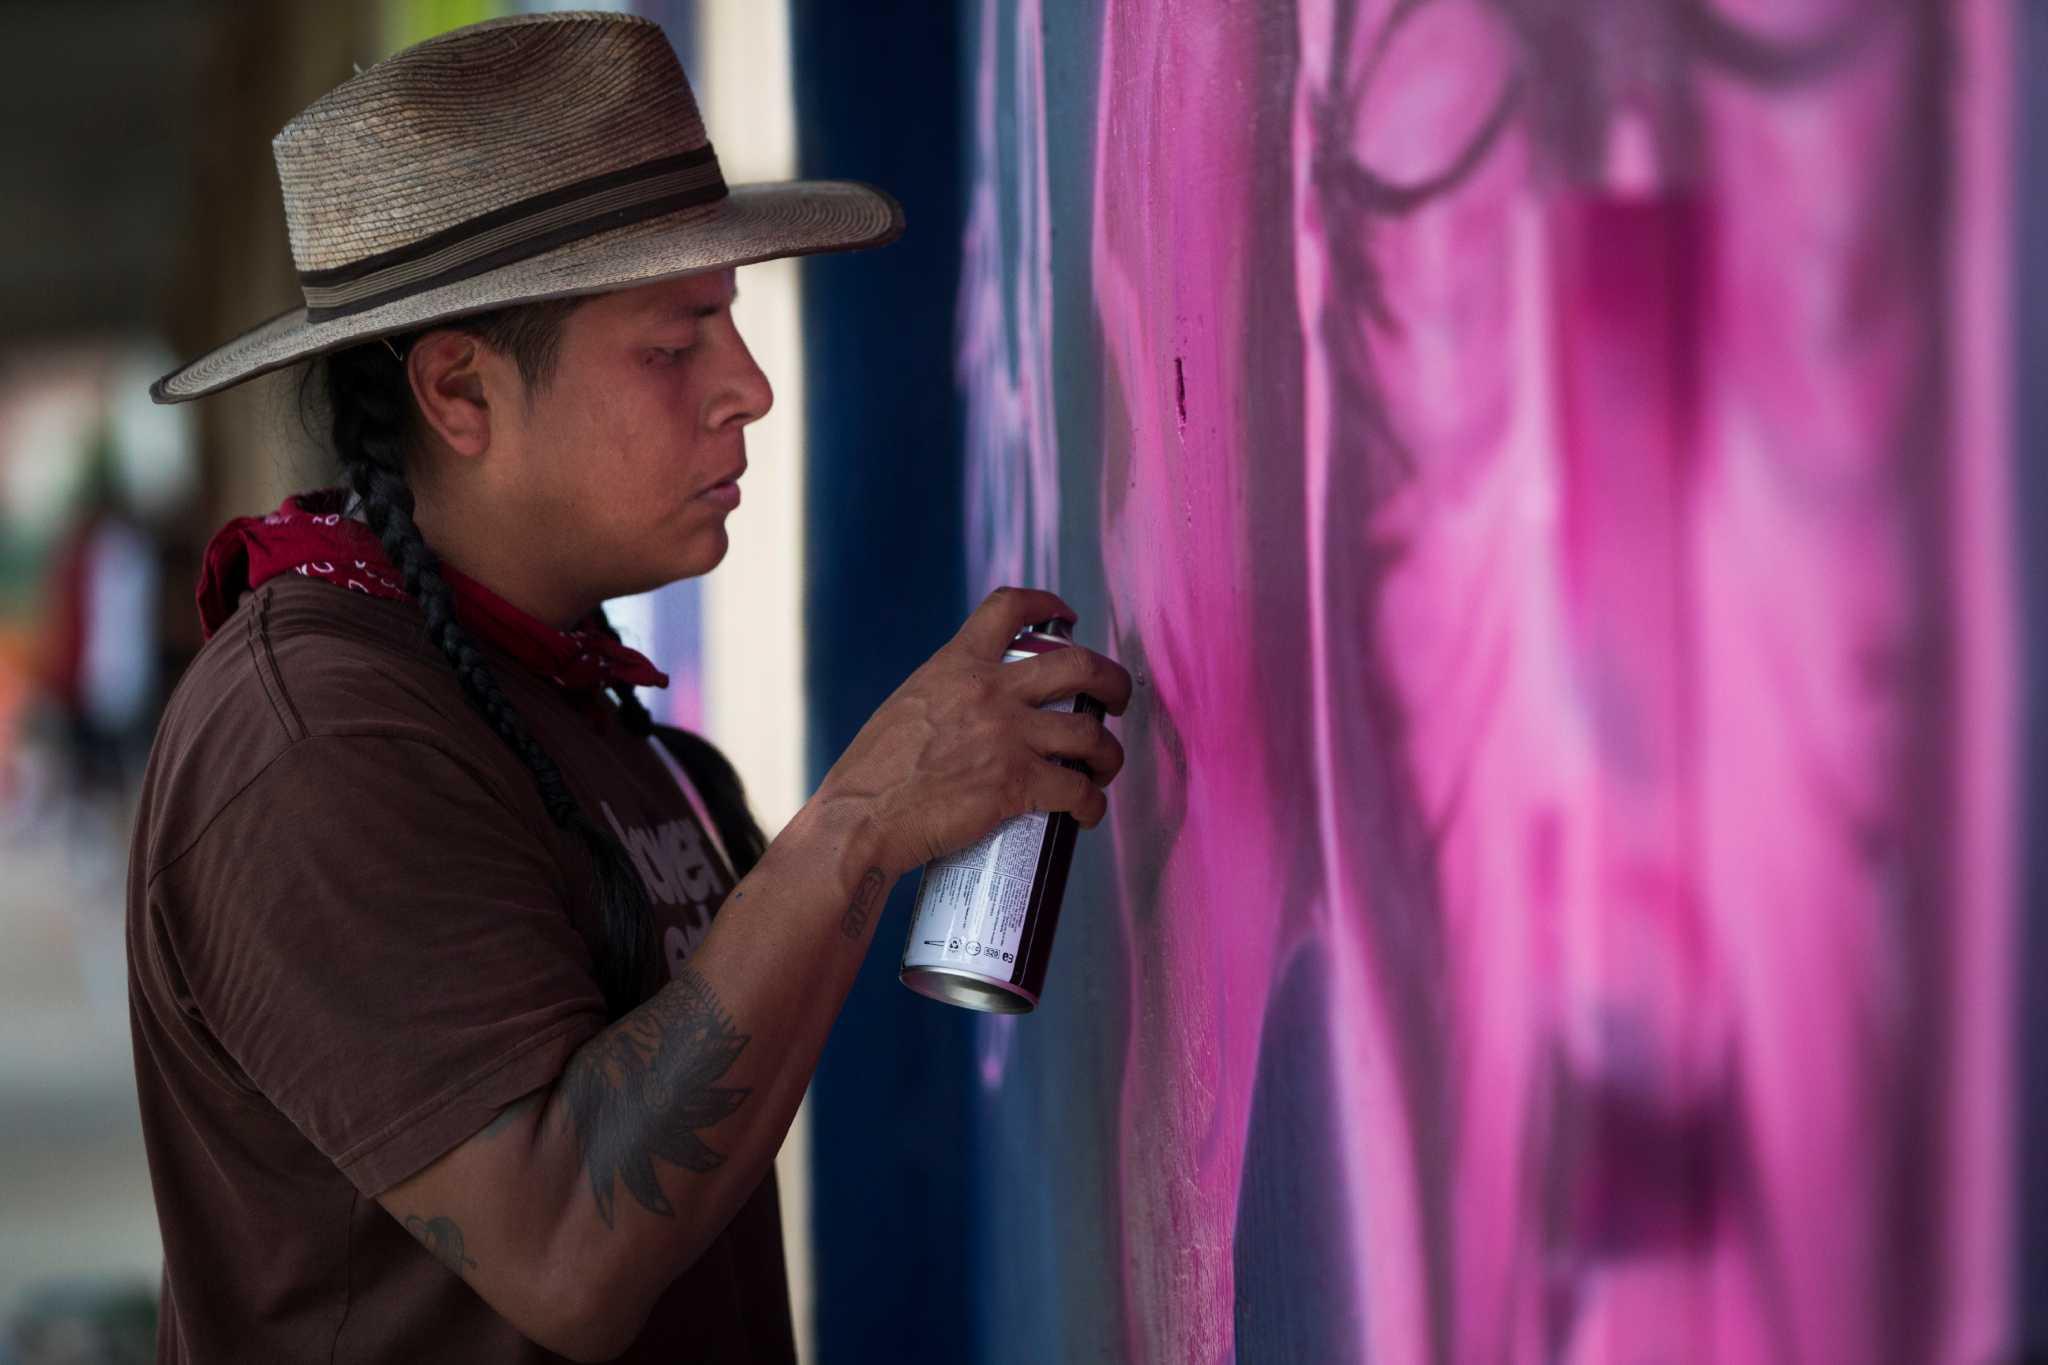 Artists decorate Houston with graffiti style - HoustonChronicle com